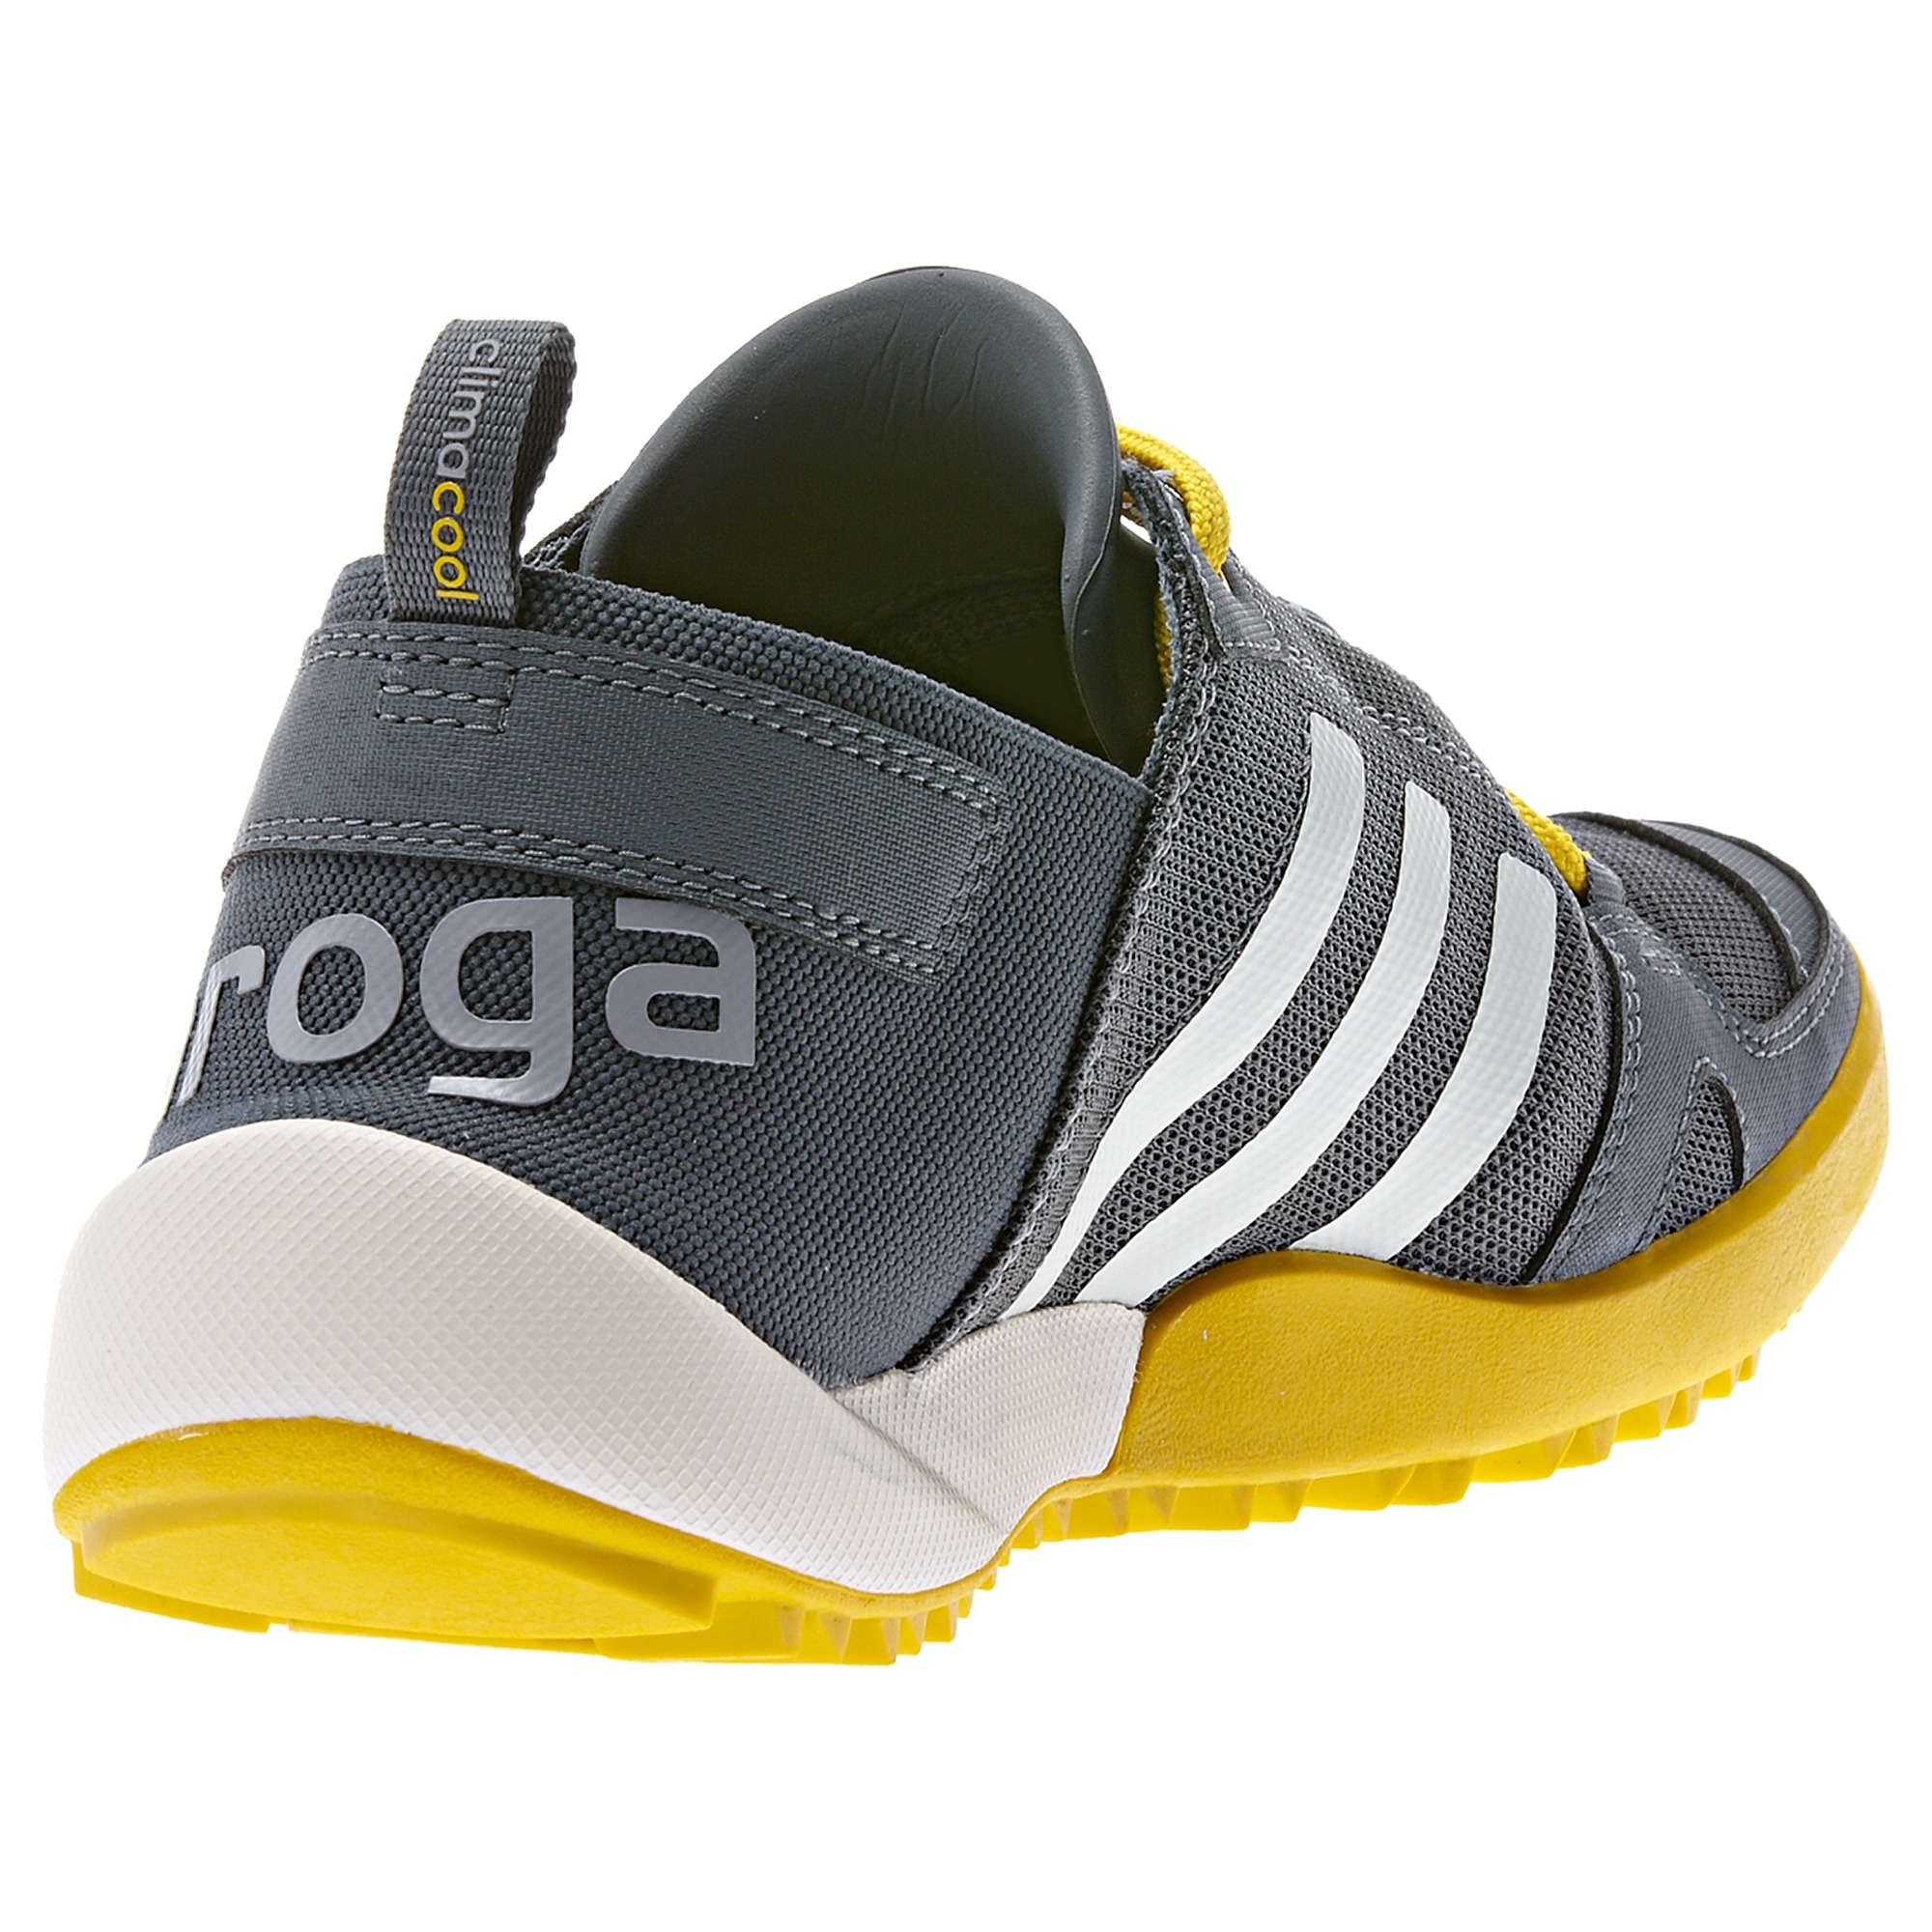 adidas Performance climacool DAROGA TWO 13 G64437 Herren